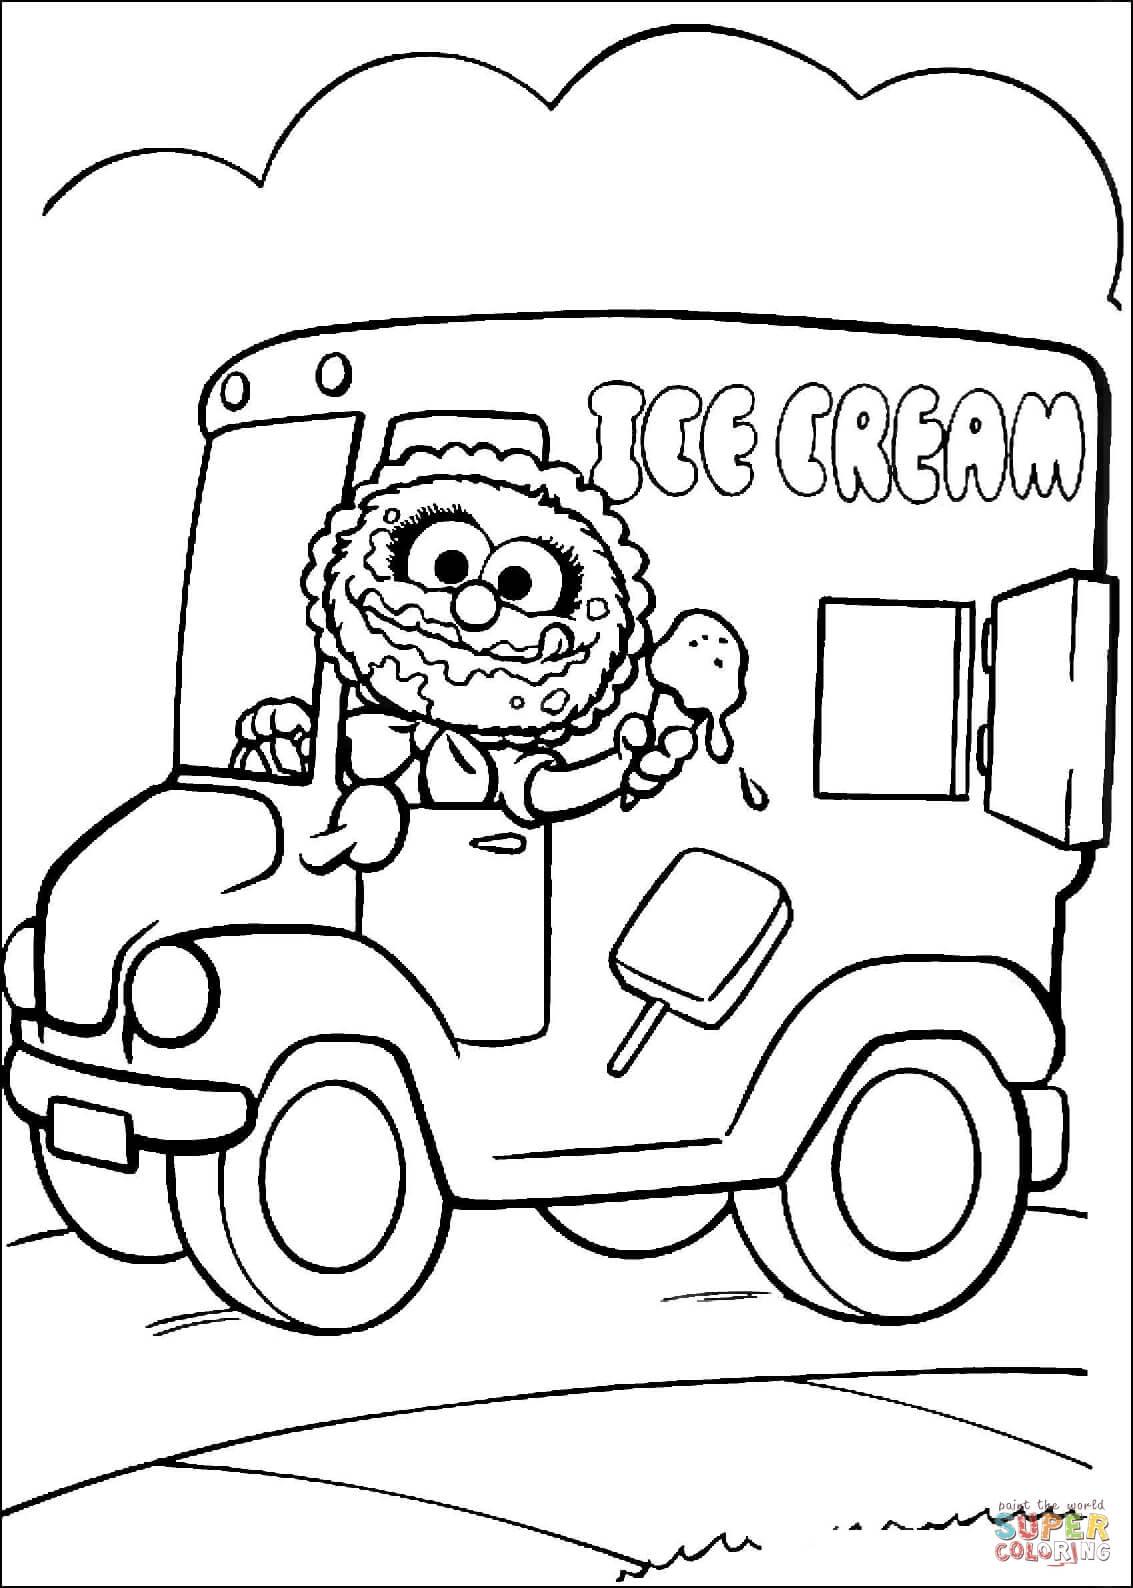 Baby Animal Drives Ice Cream Van Coloring Page Free Printable